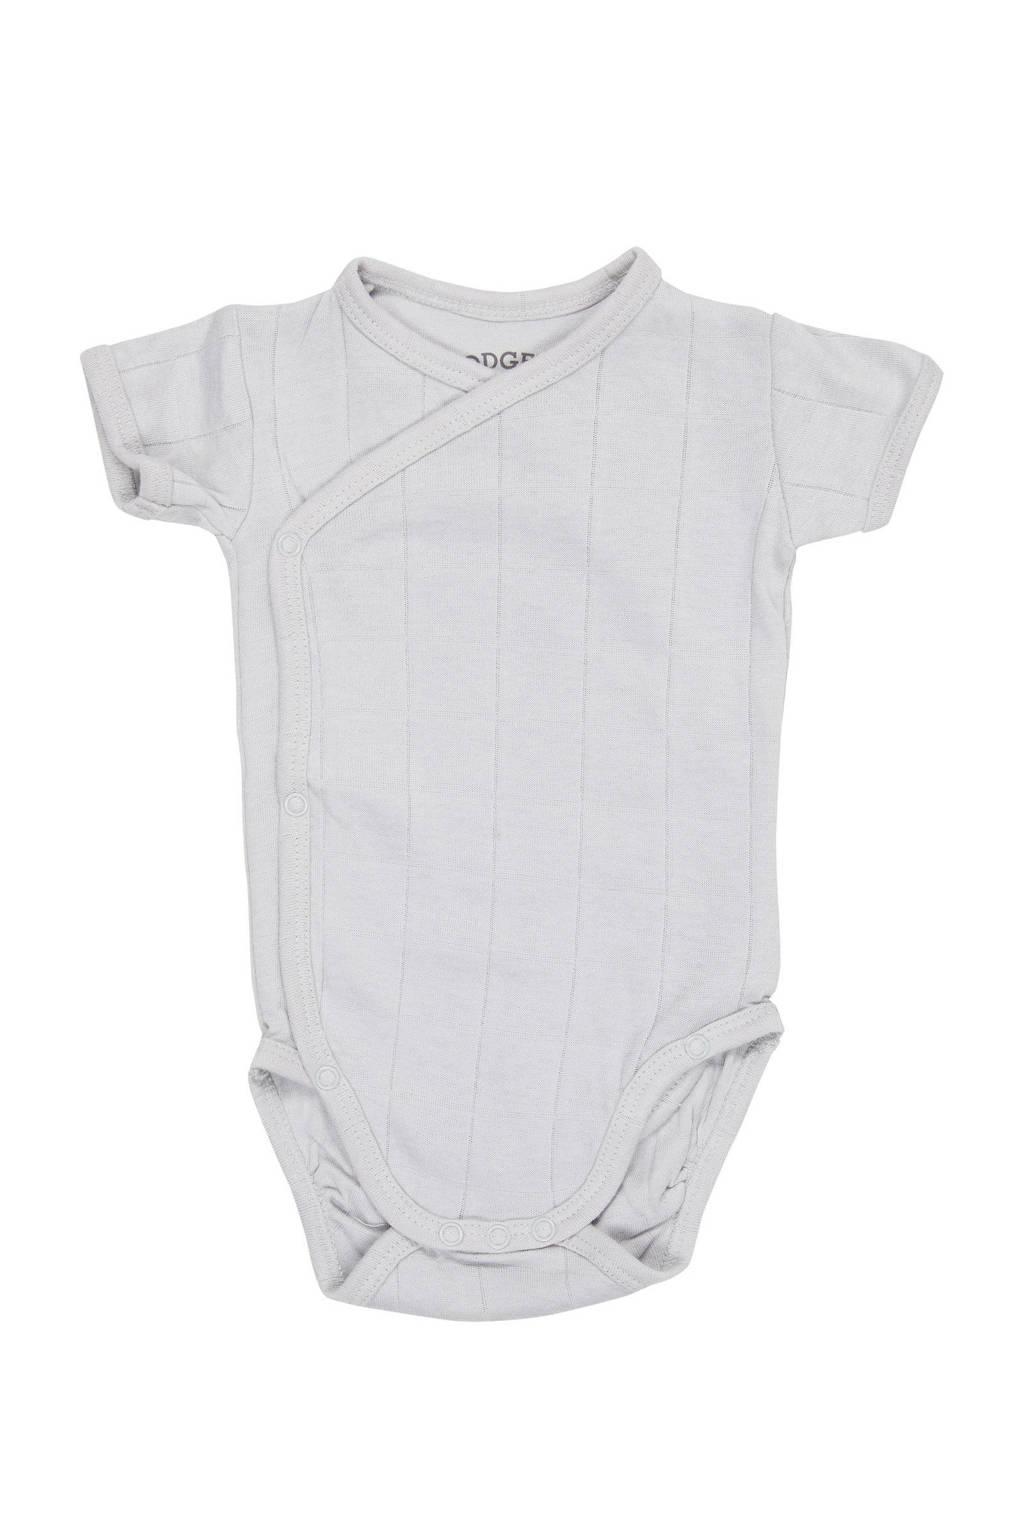 Lodger newborn baby romper Solid, Grijs